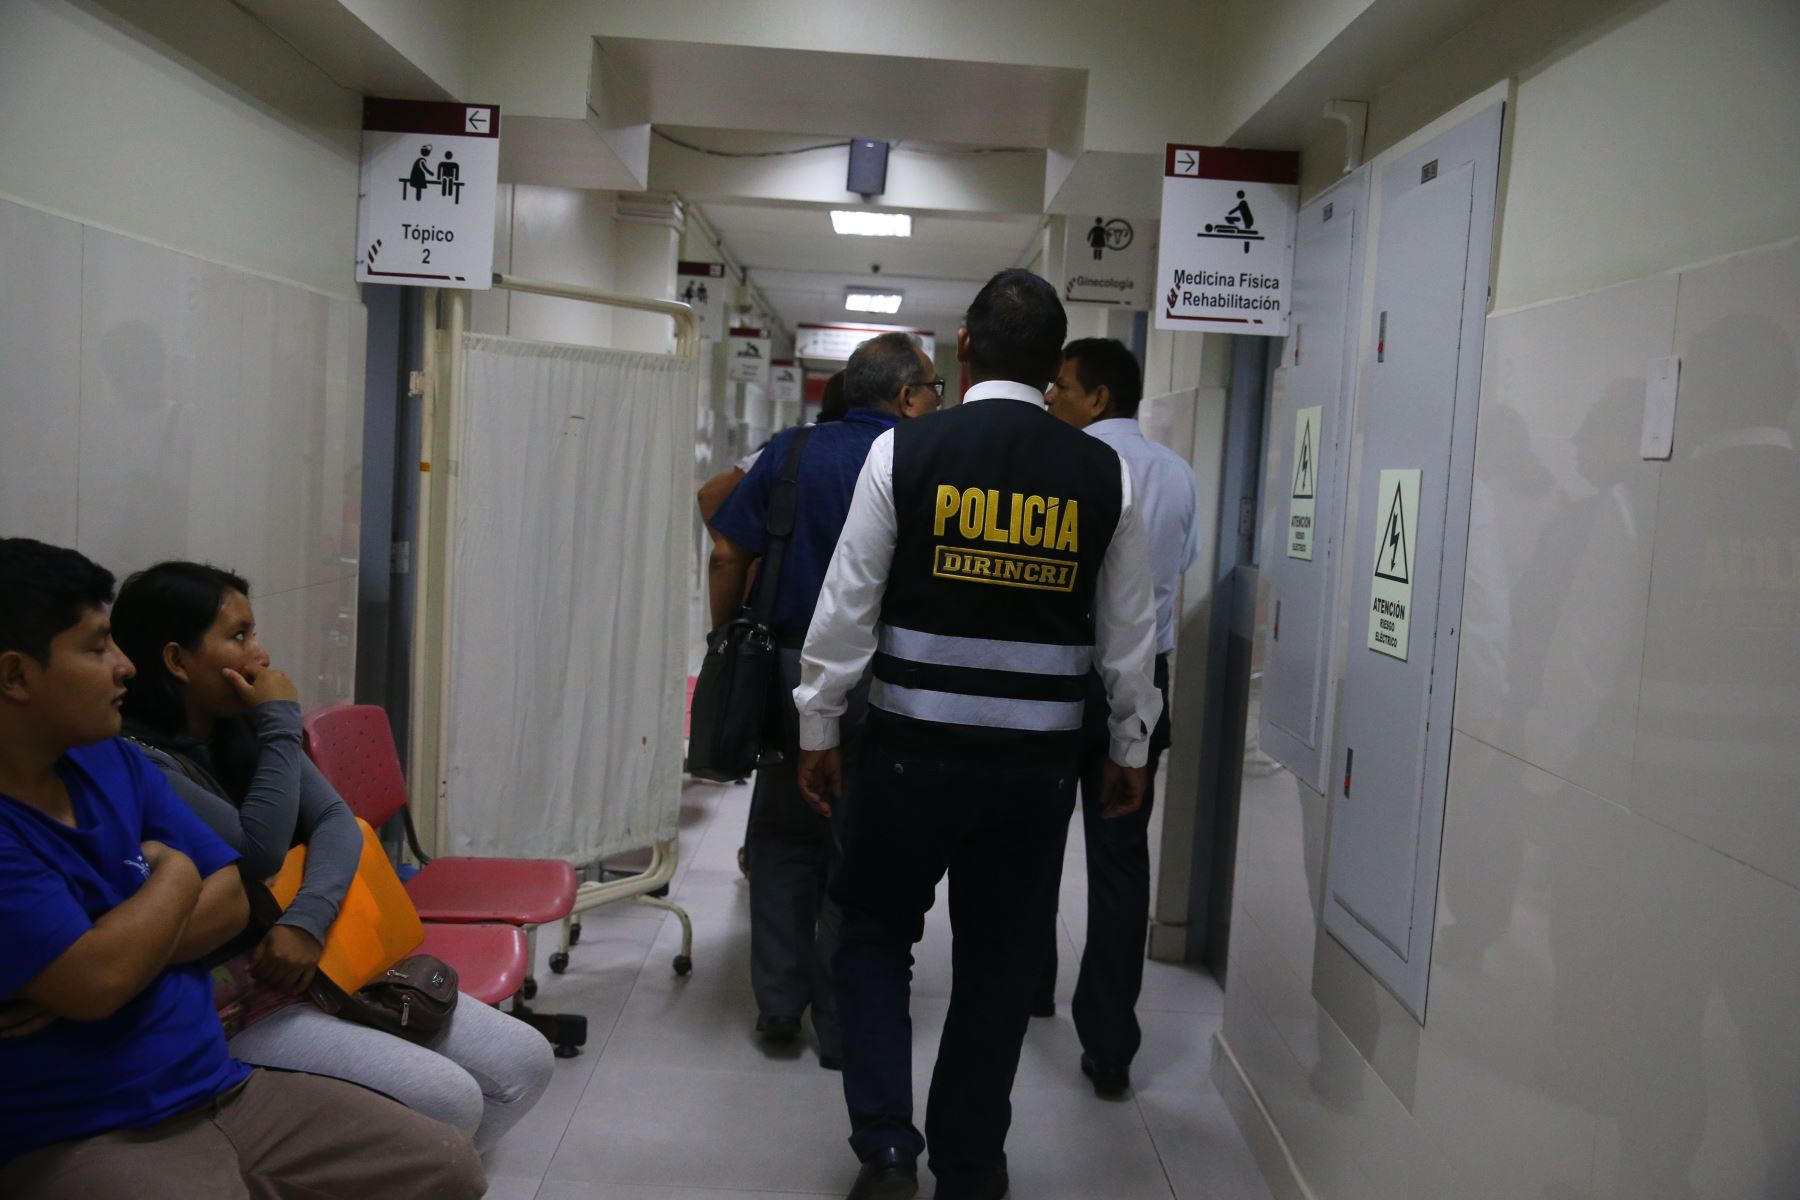 Interiores del hospital Casimiro Ulloa, donde fue internado de emergencia el expresidente Alan García. Foto: ANDINA/ Vidal Tarqui